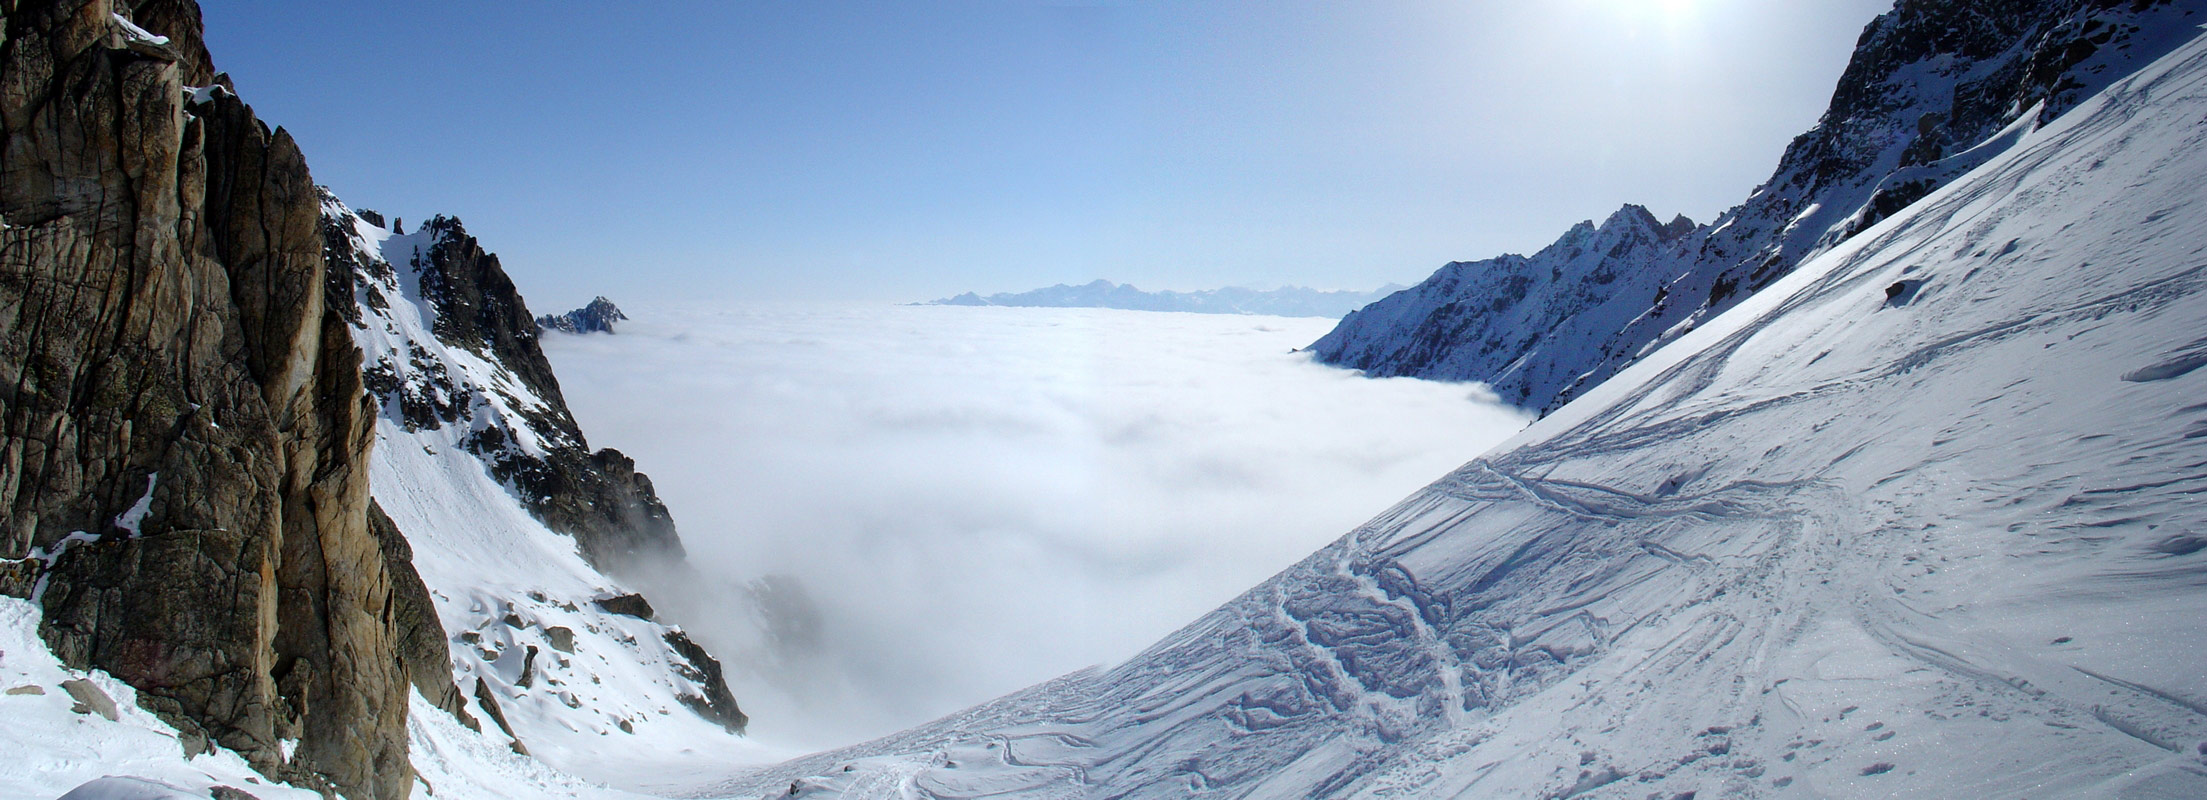 Val Arpette (Day2, H.R. Chamonix-Zermatt) Walliser Alpen / Alpes valaisannes Švýcarsko panorama 19